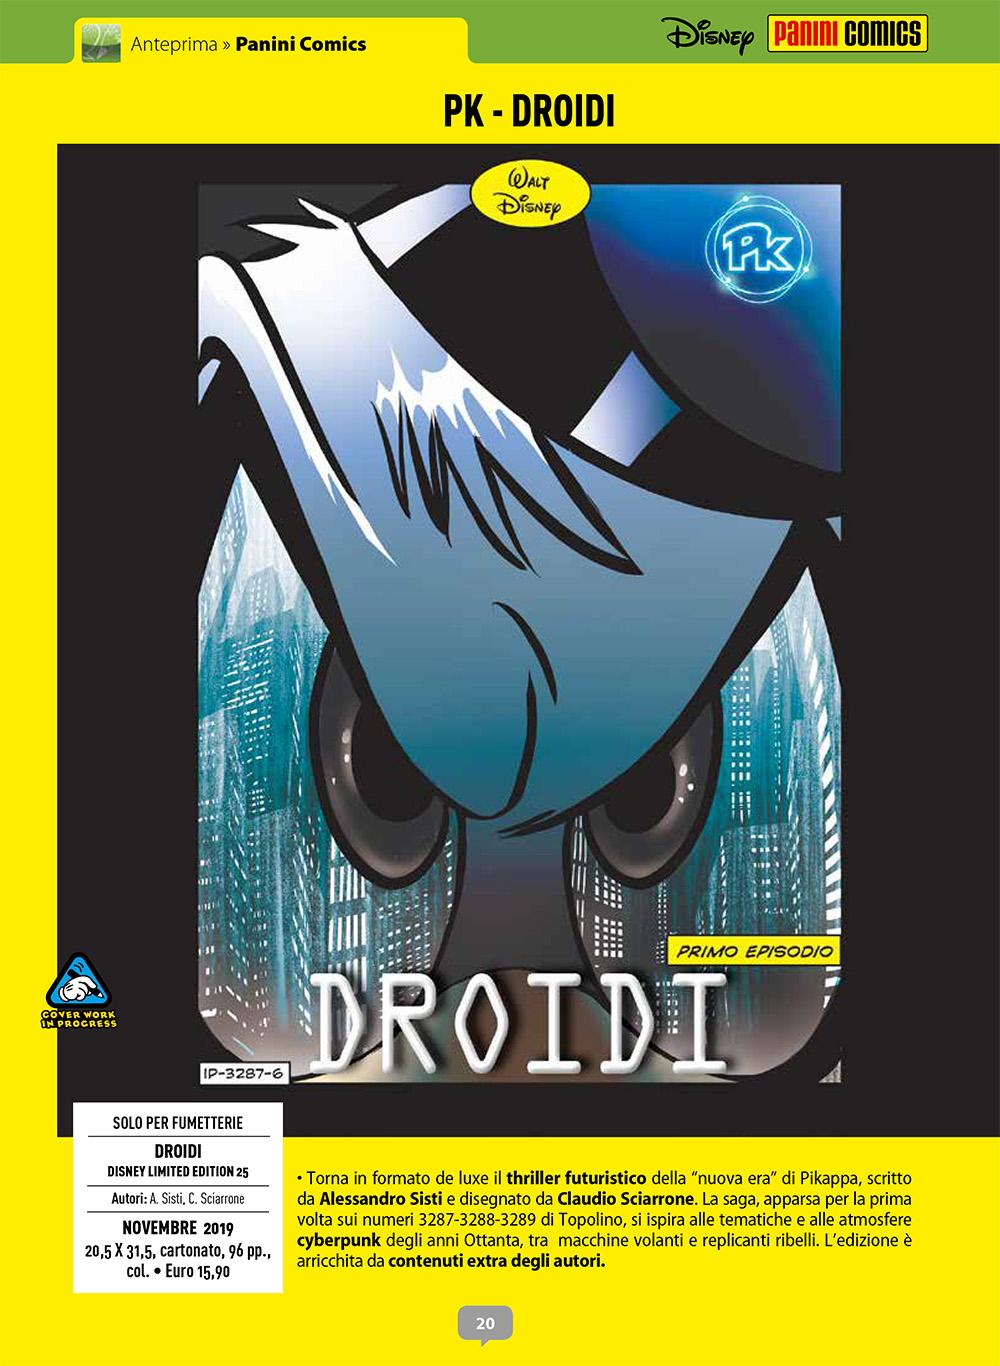 Droidi